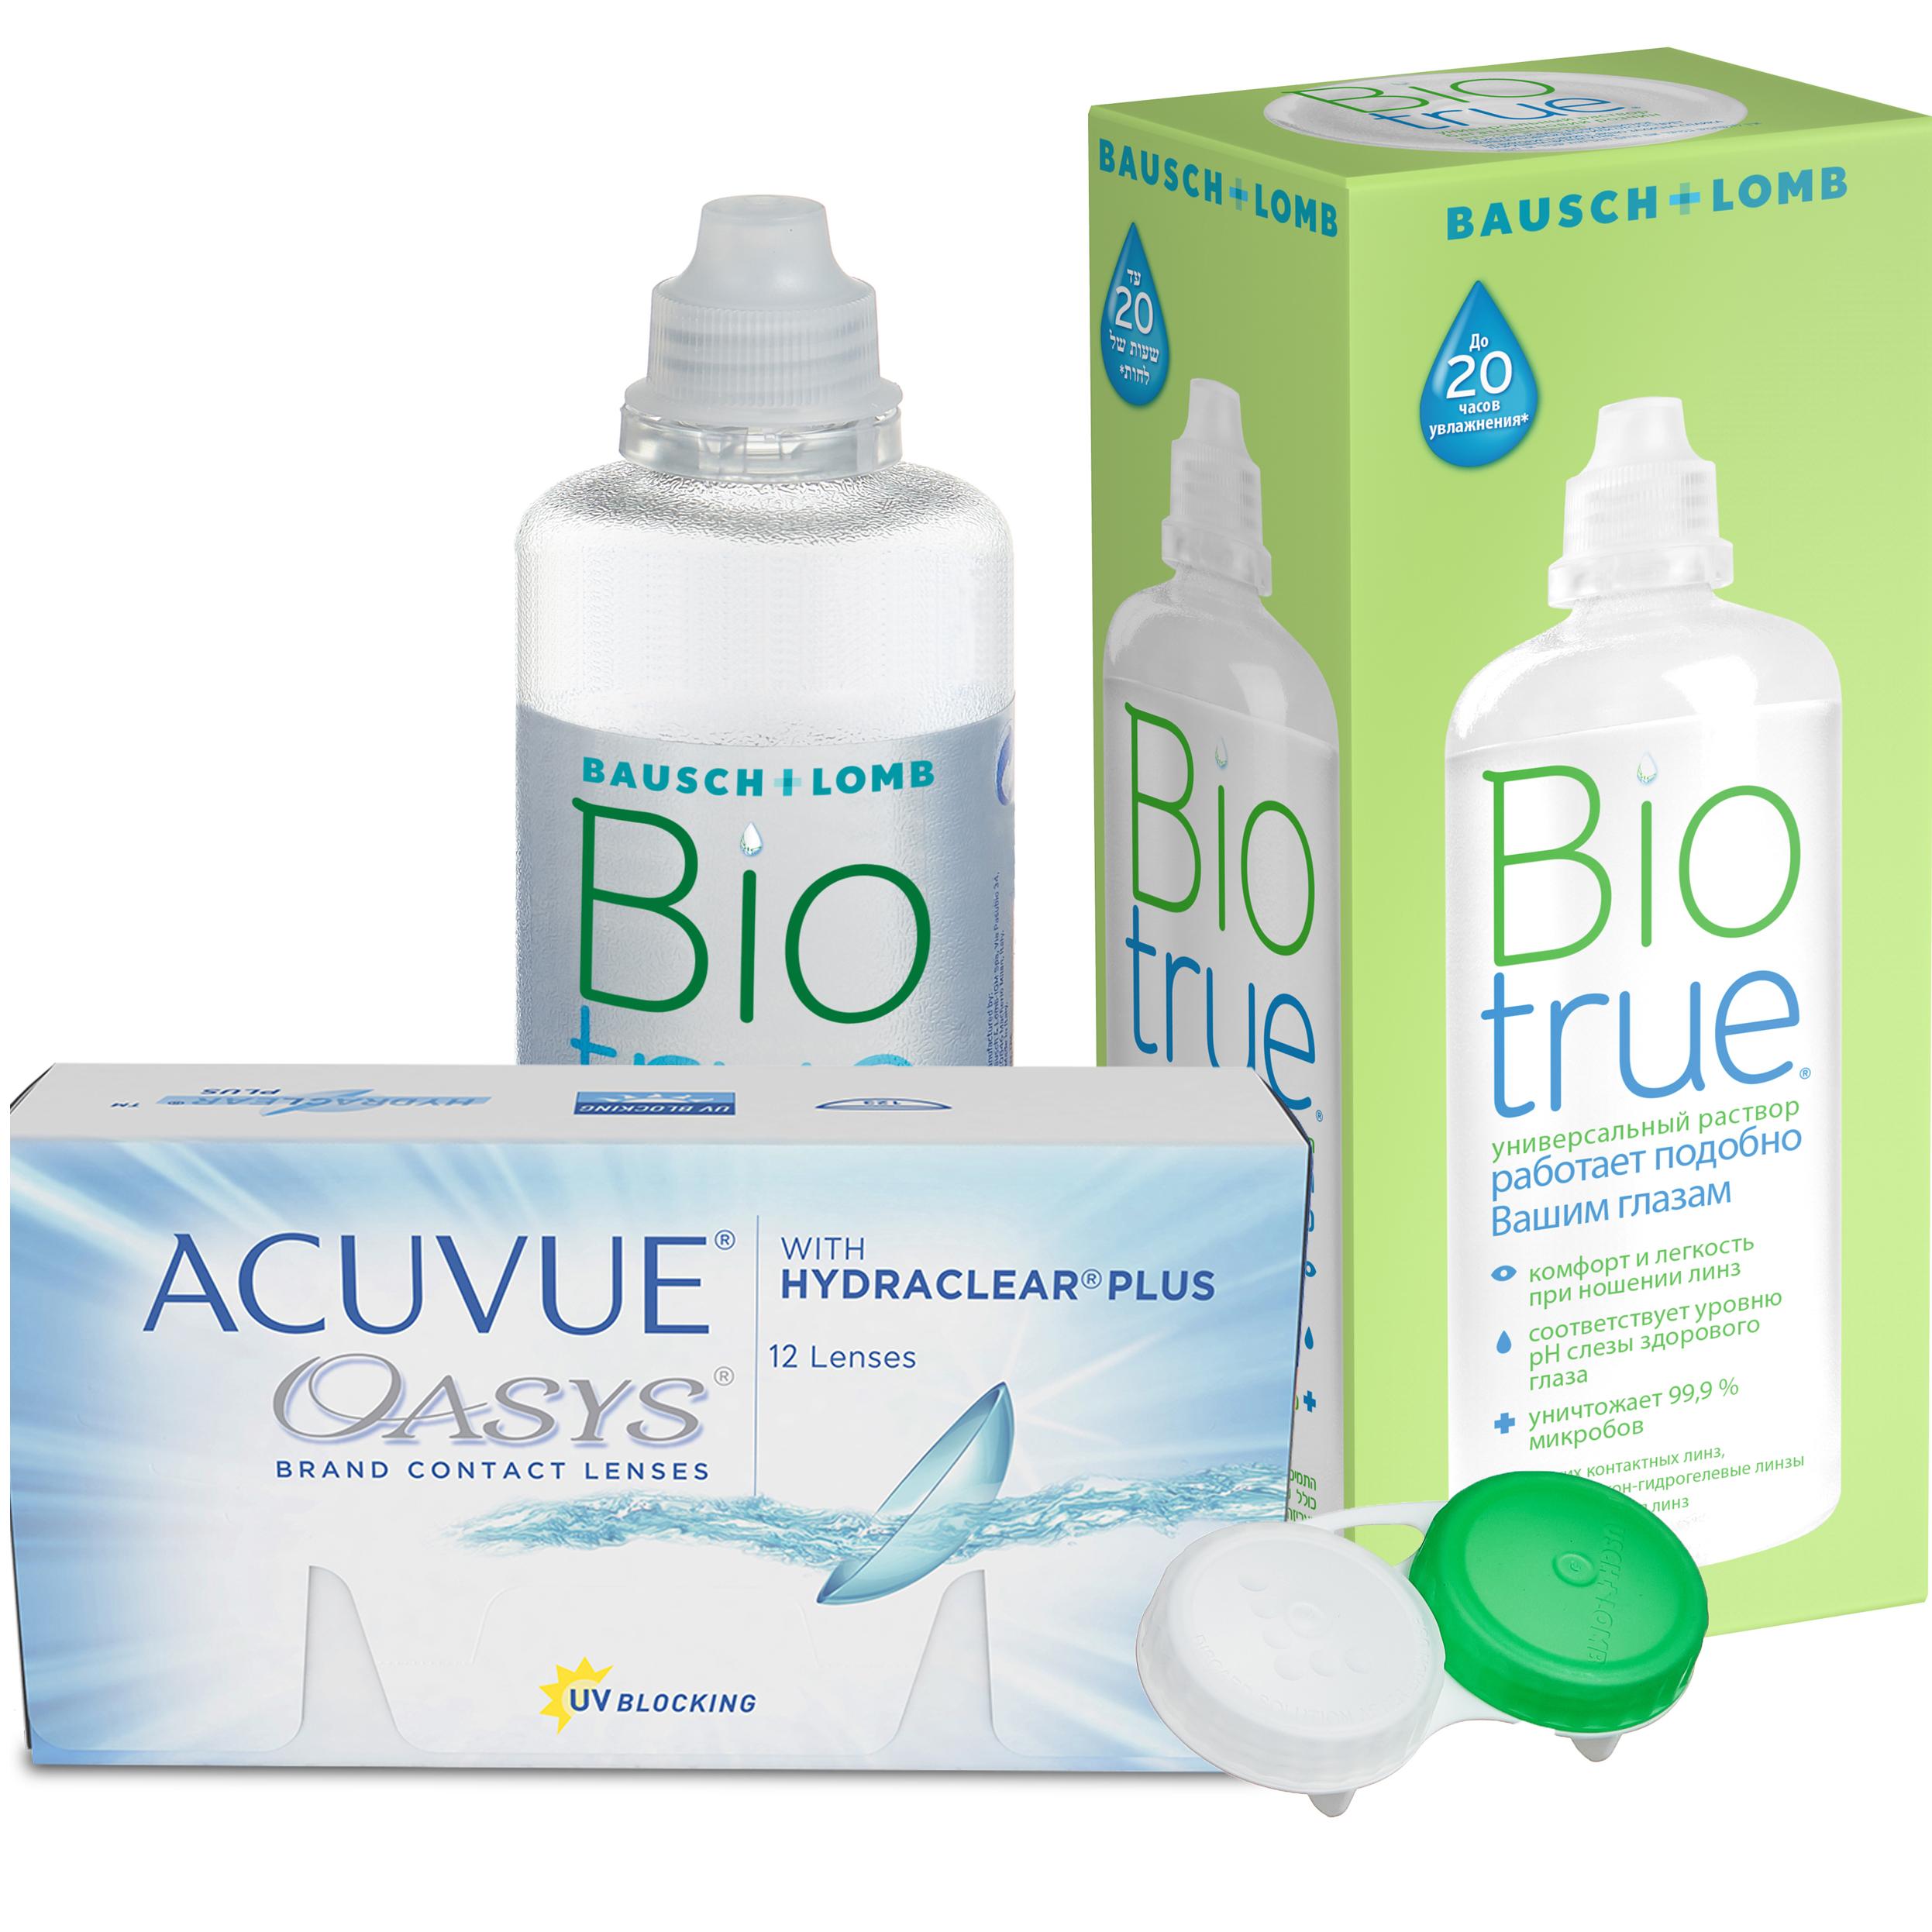 Купить Oasys with Hydraclear Plus 12 линз + Biotrue, Контактные линзы Acuvue Oasys with Hydraclear Plus 12 линз R 8.8 -4, 50 + Biotrue 300 мл